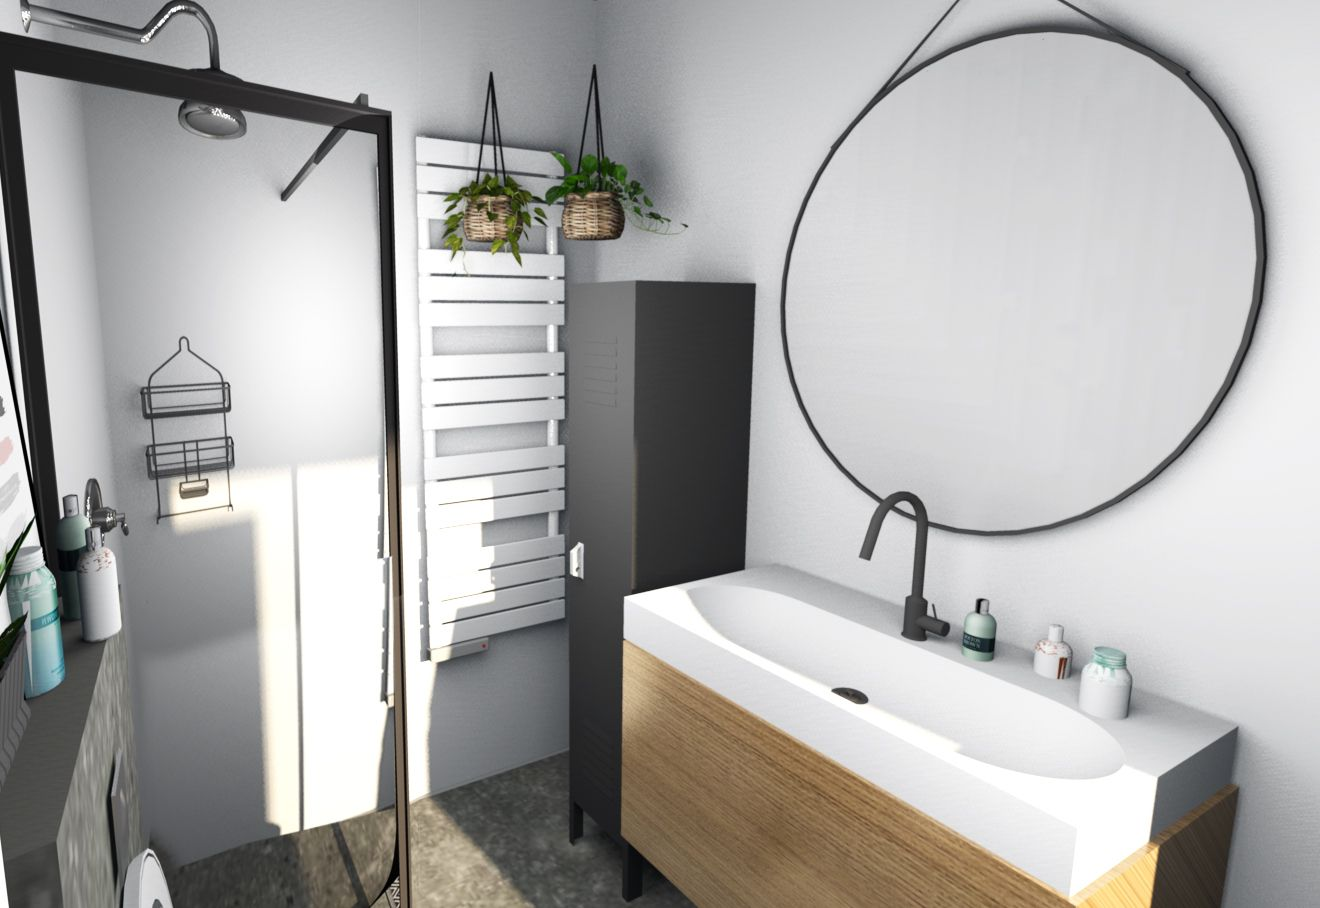 Houten Onderkast Badkamer : Badkamer van beton tegel zwart plafond houten onderkast locker